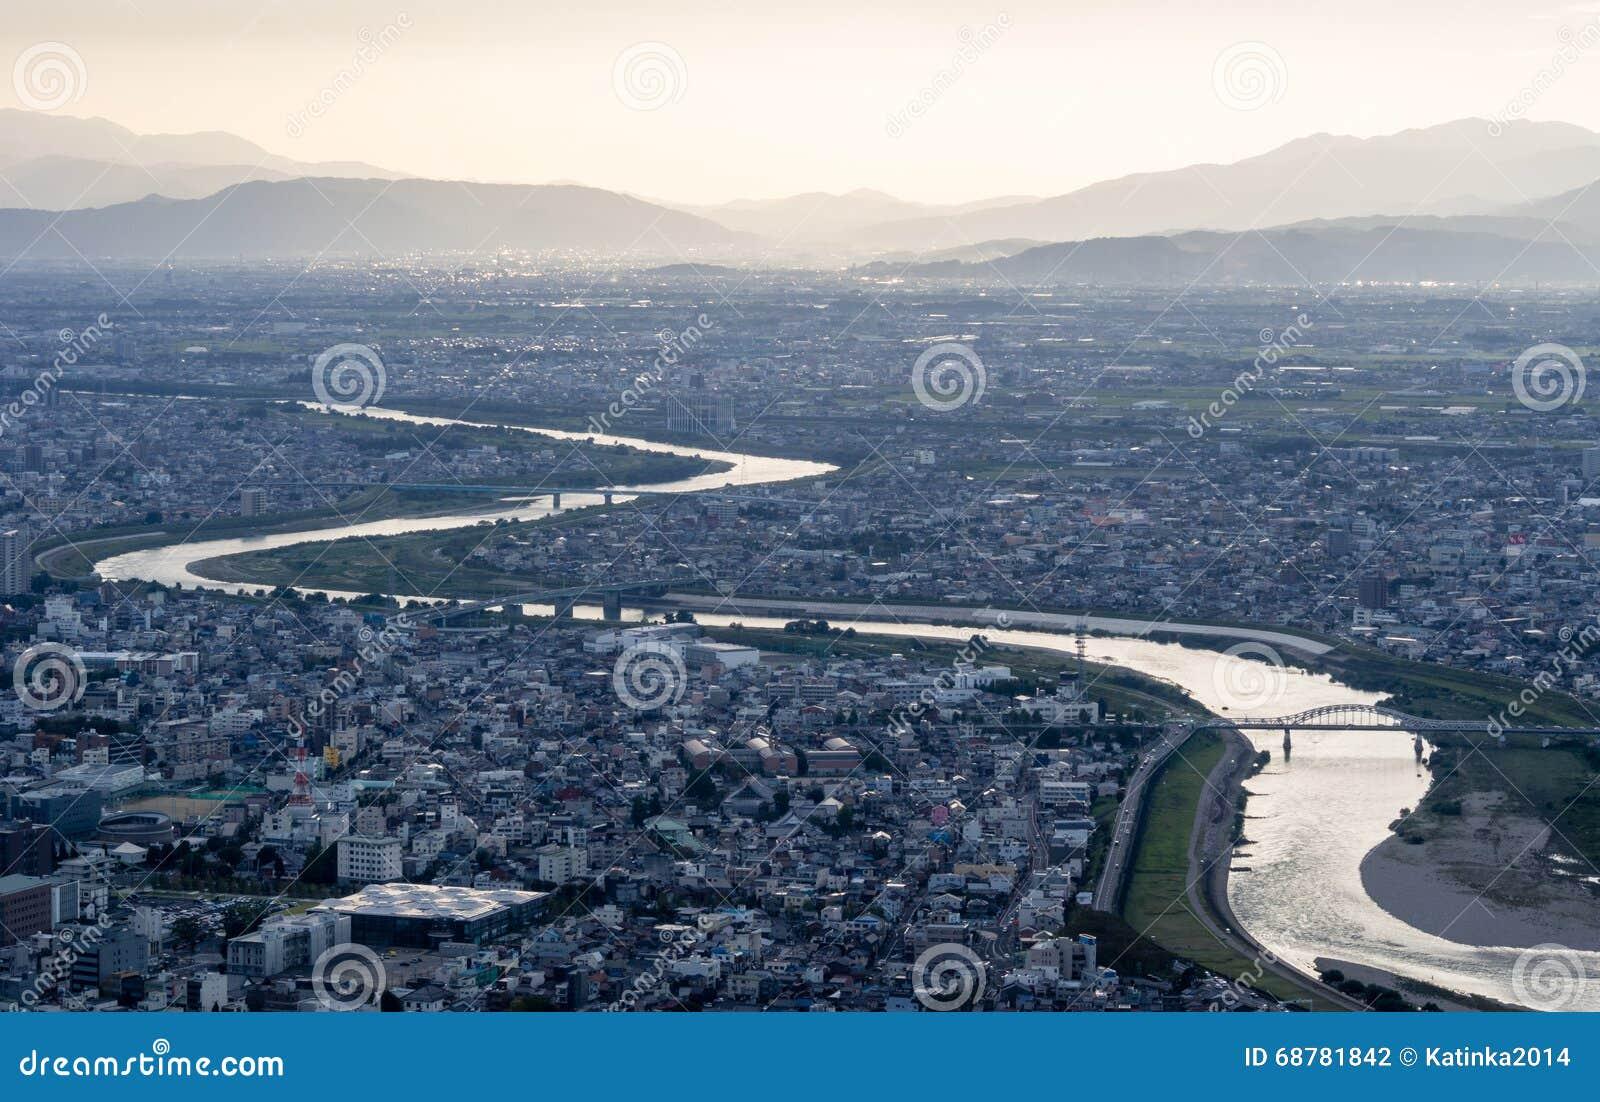 Panoramic view of Gifu city, Japan